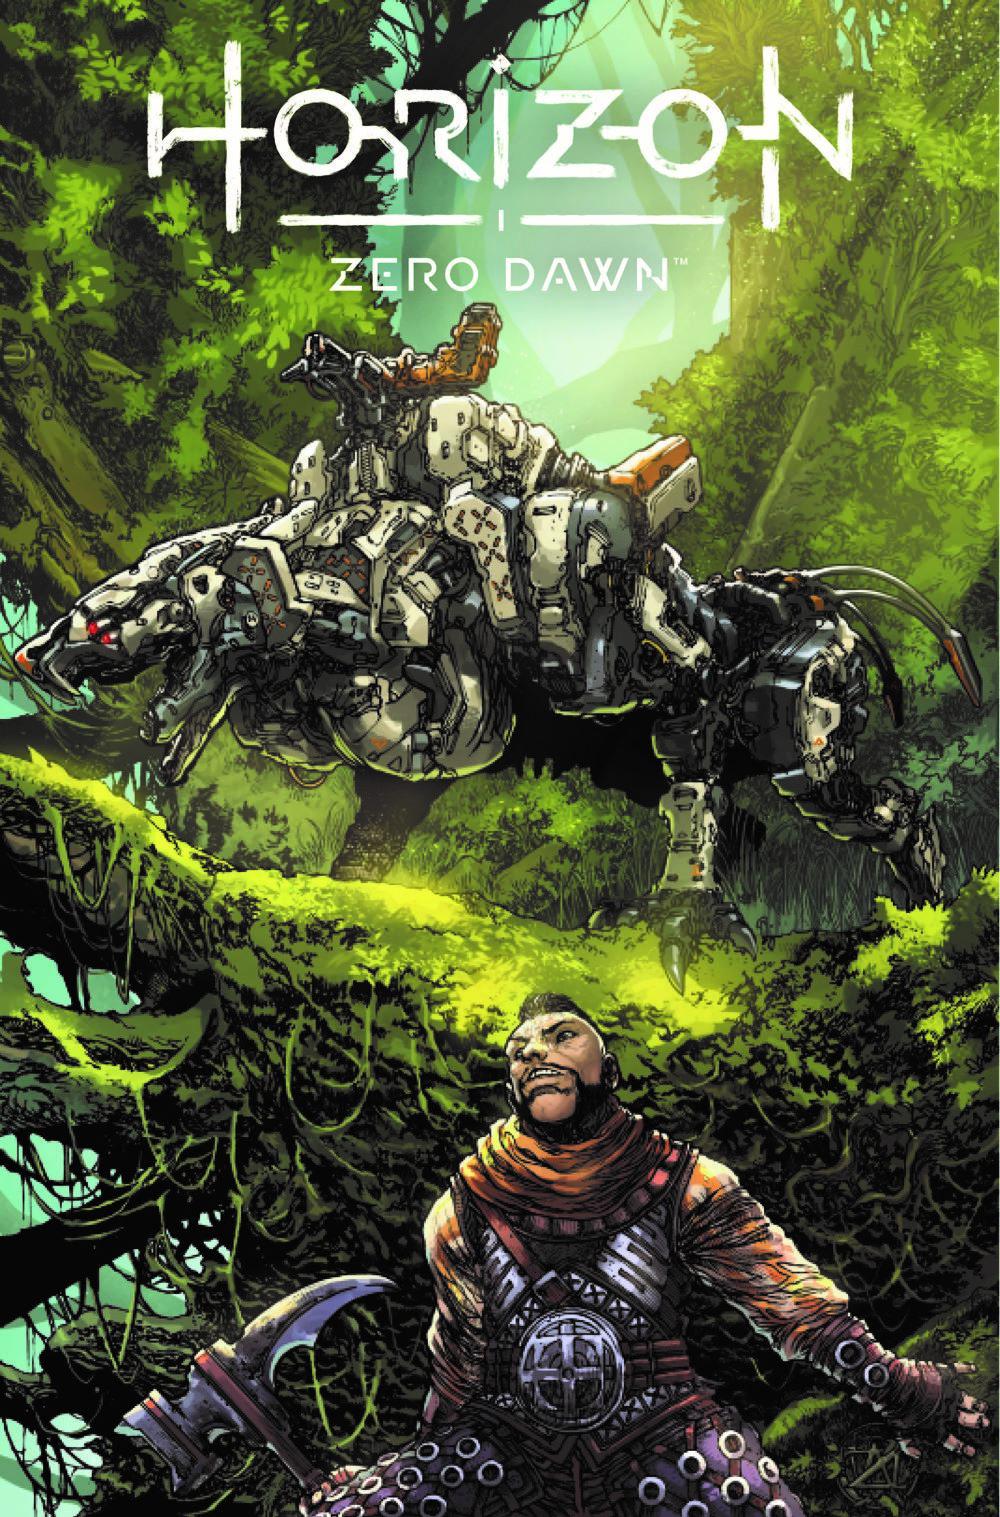 HorizonZeroDawn21_00_CoverC_TOLIBAO-1 Titan Comics July 2021 Solicitations